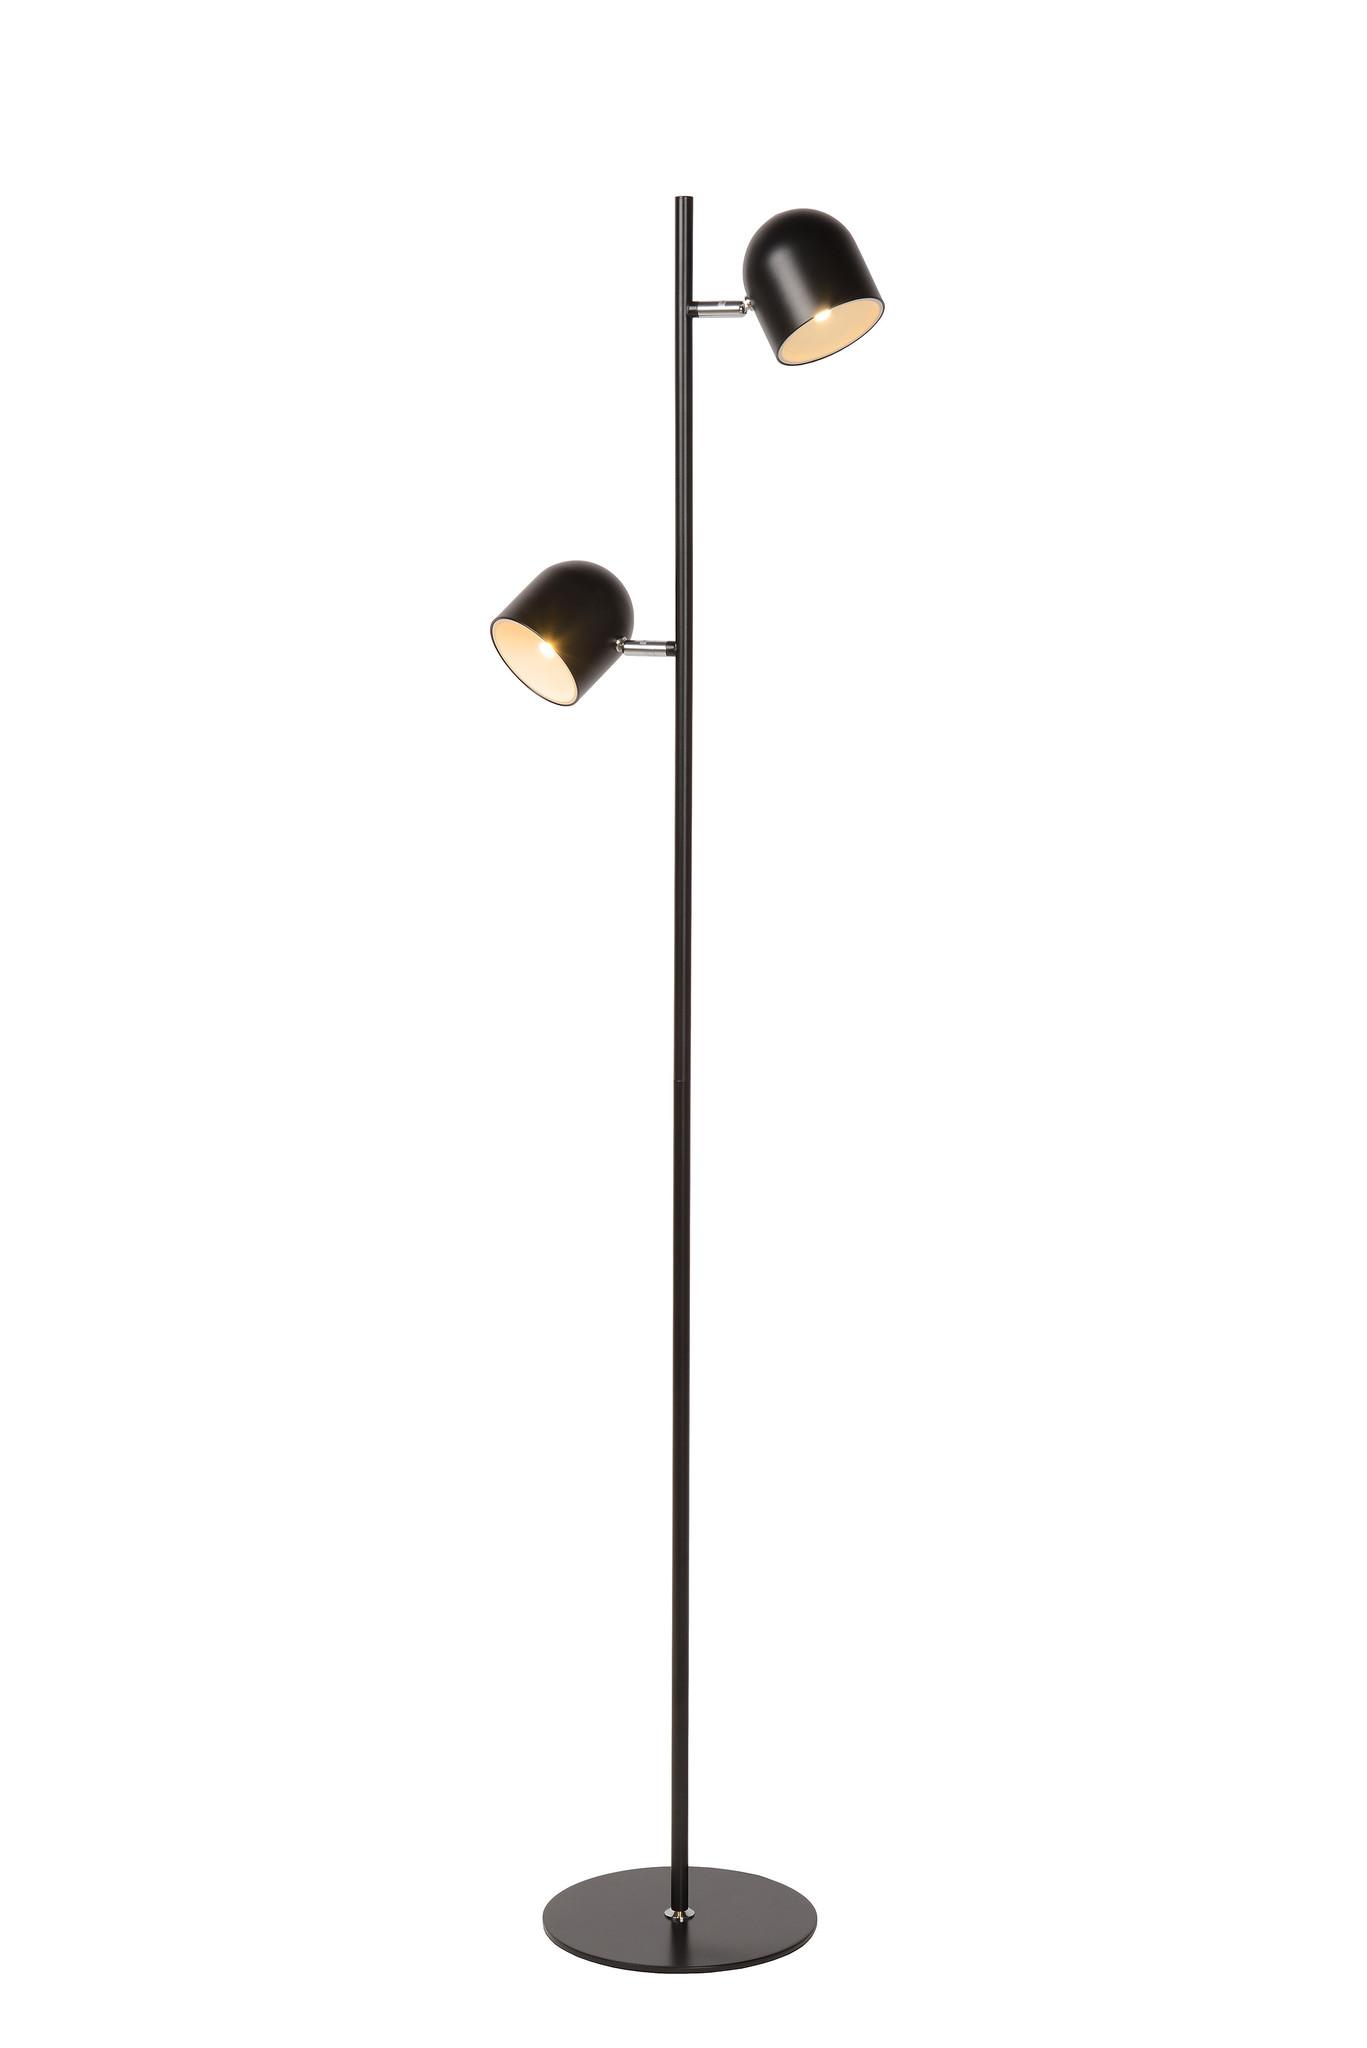 Lucide SKANSKA Vloerlamp-Zwart-LED Dimb.-5W-3000K-Metaal